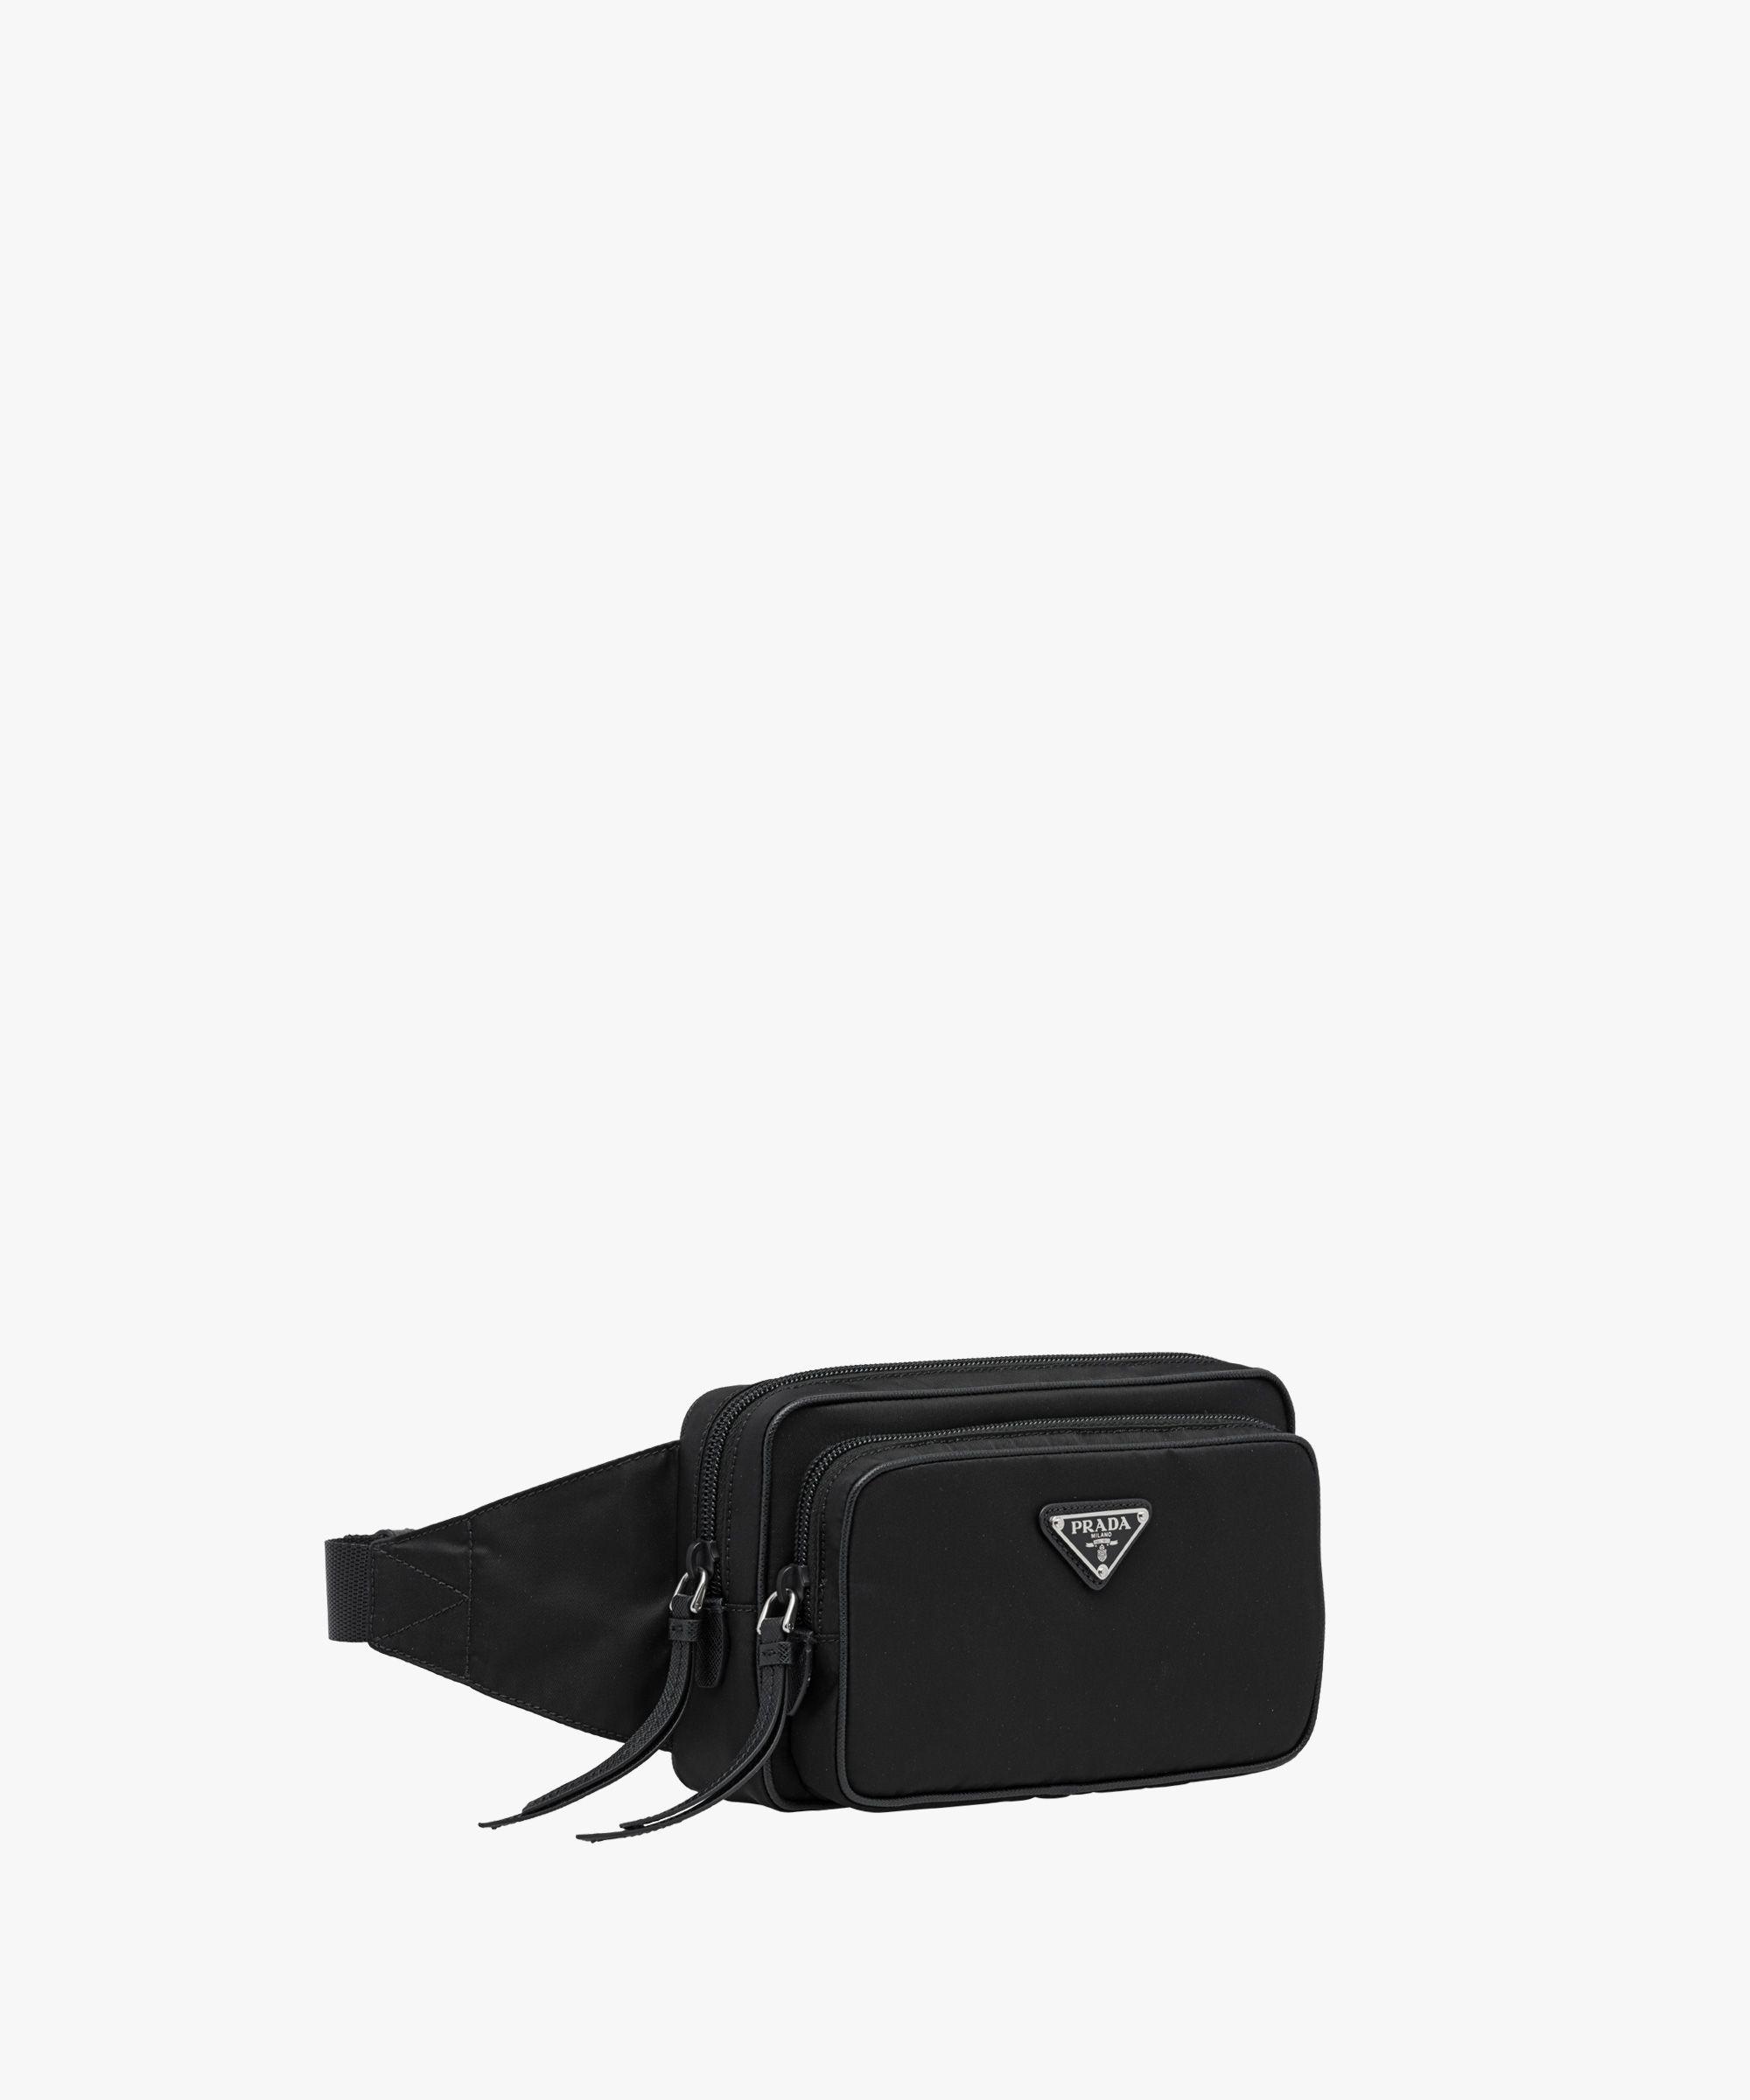 0b715ad3 Prada - Nylon and leather belt bag | BAGS | Leather belt bag, Bags ...